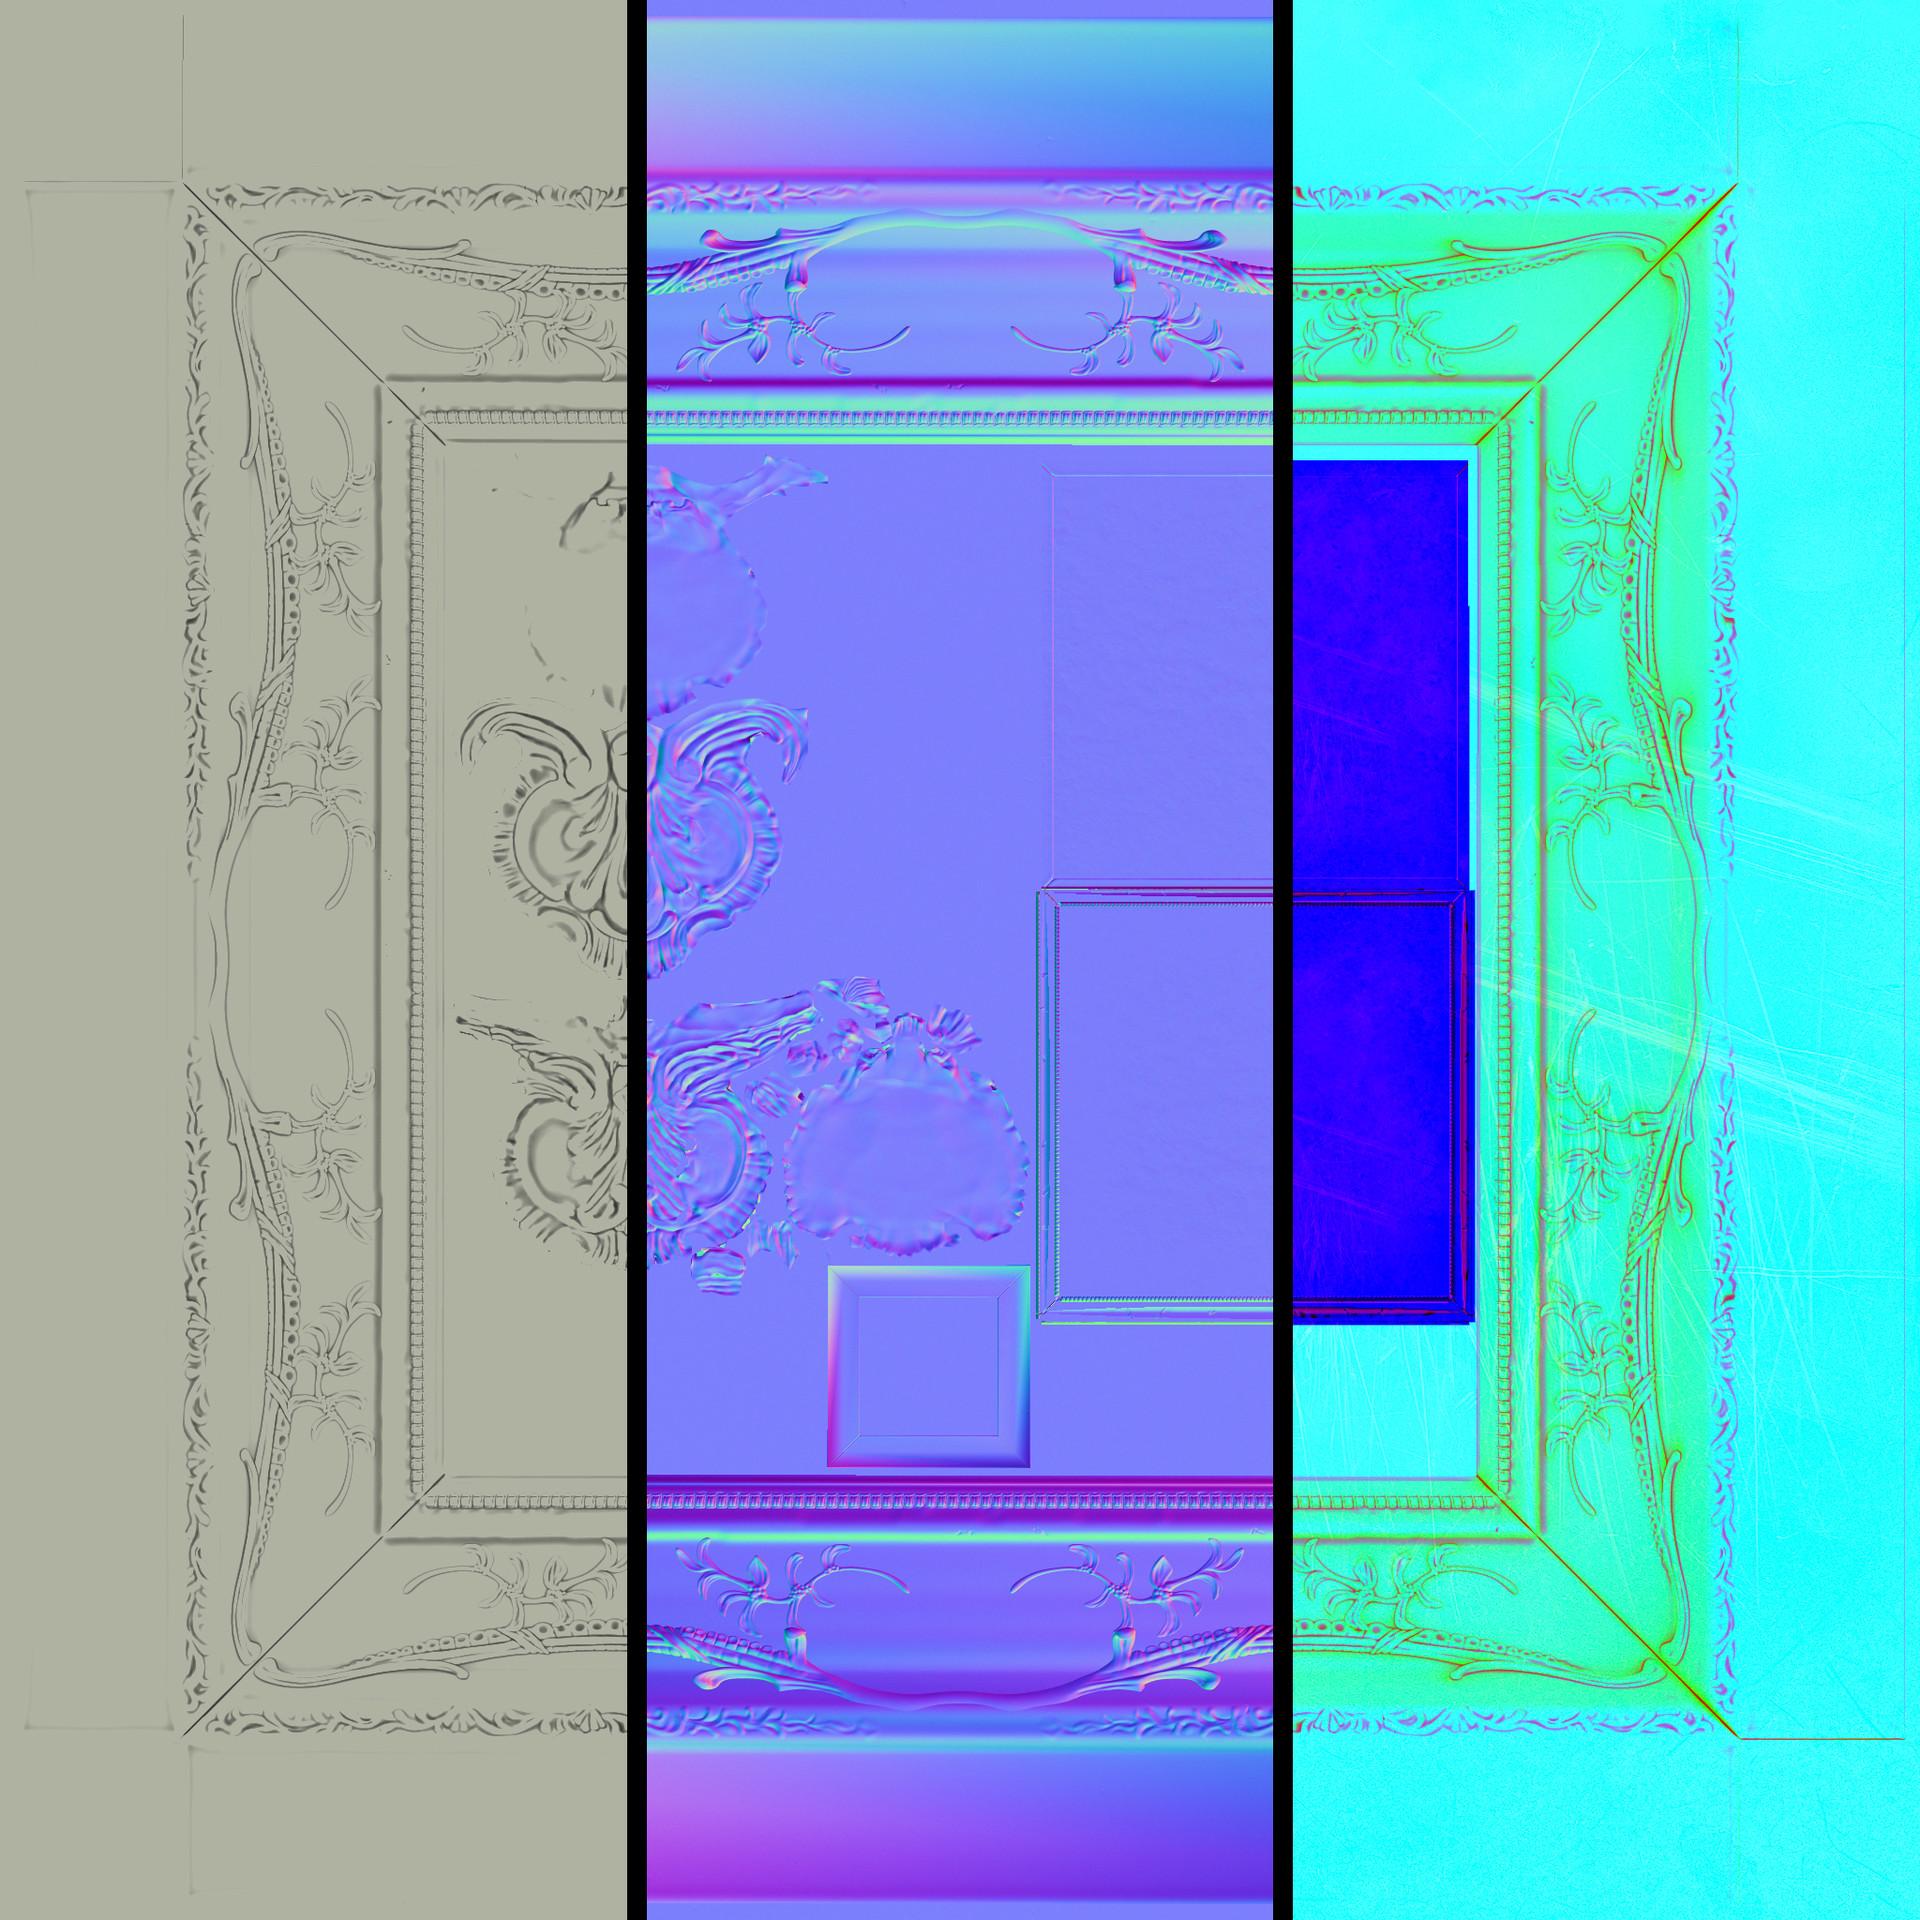 Caleb arthur mirror texture breakdown